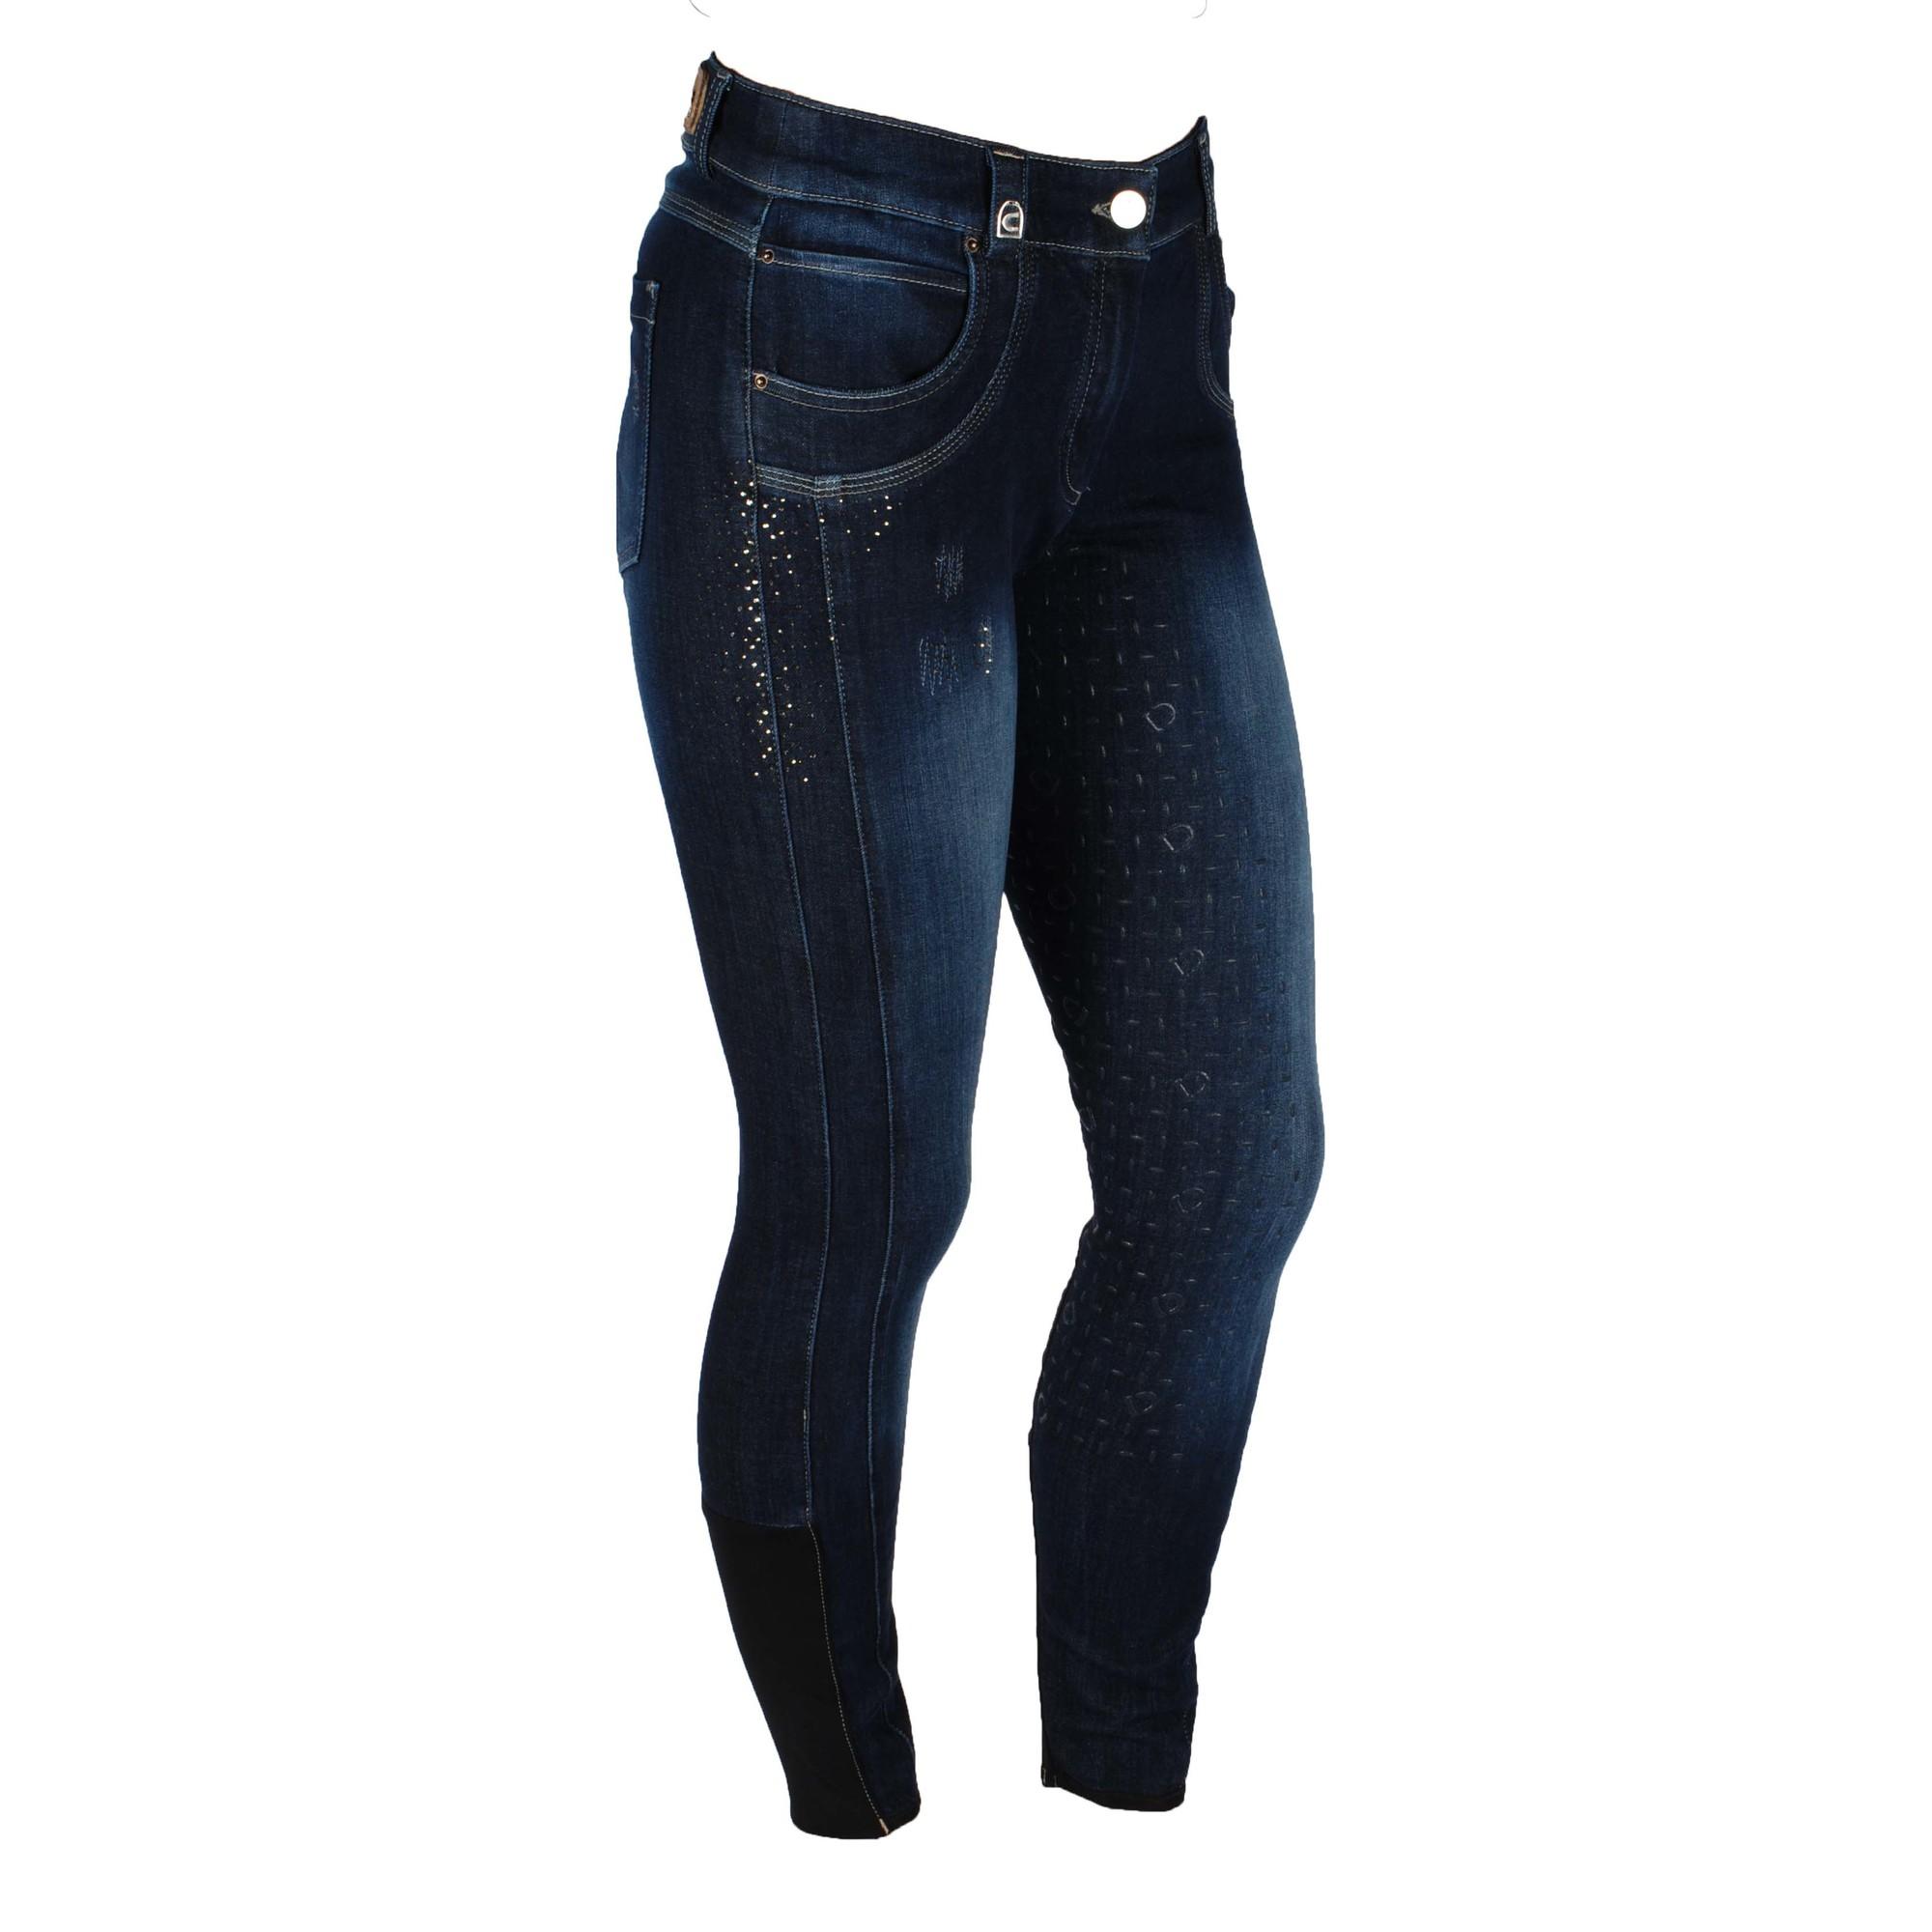 Cavallo Chaya Pro grip rijbroek jeans maat:40